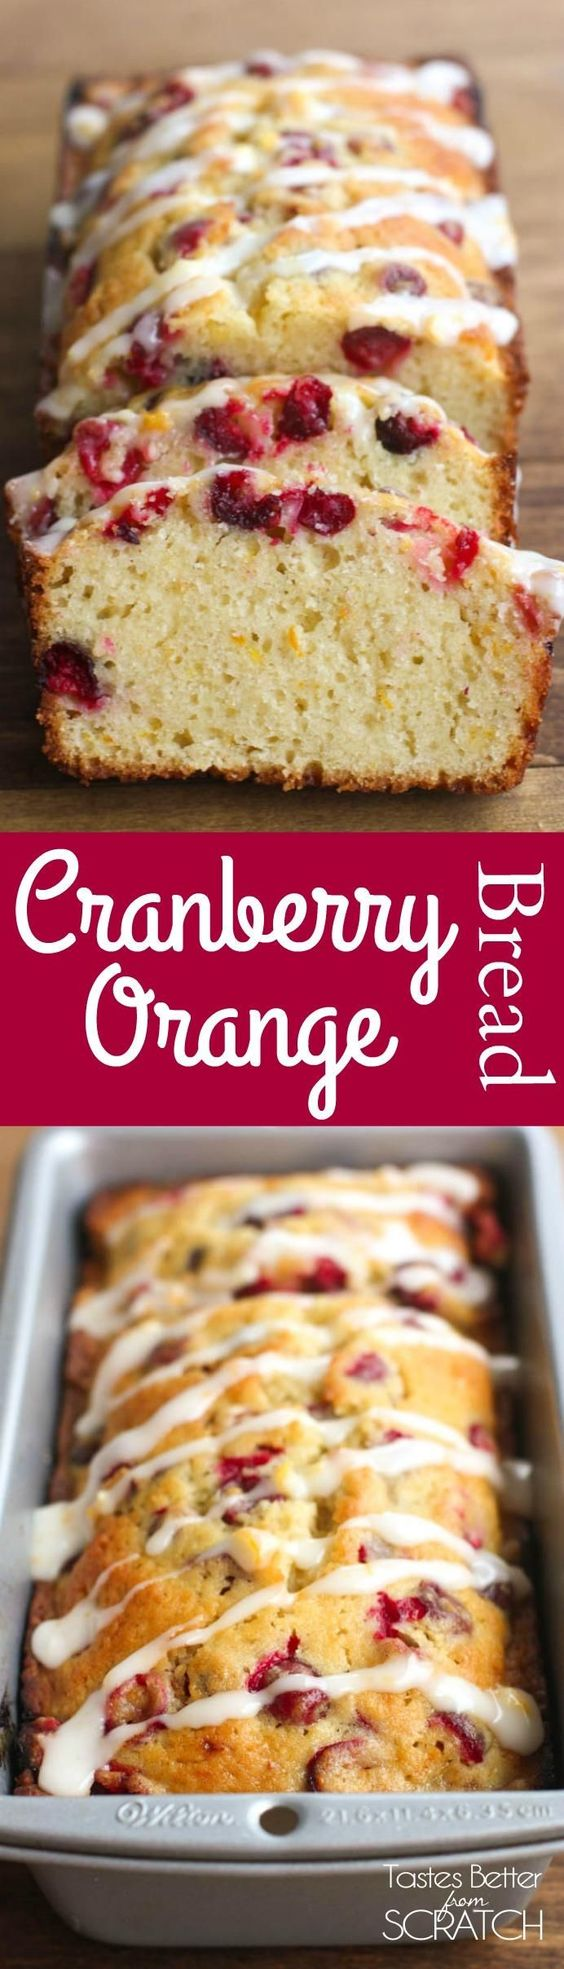 Cranberry Orange Bread with a sweet orange glaze | Tastes Better From Scratch